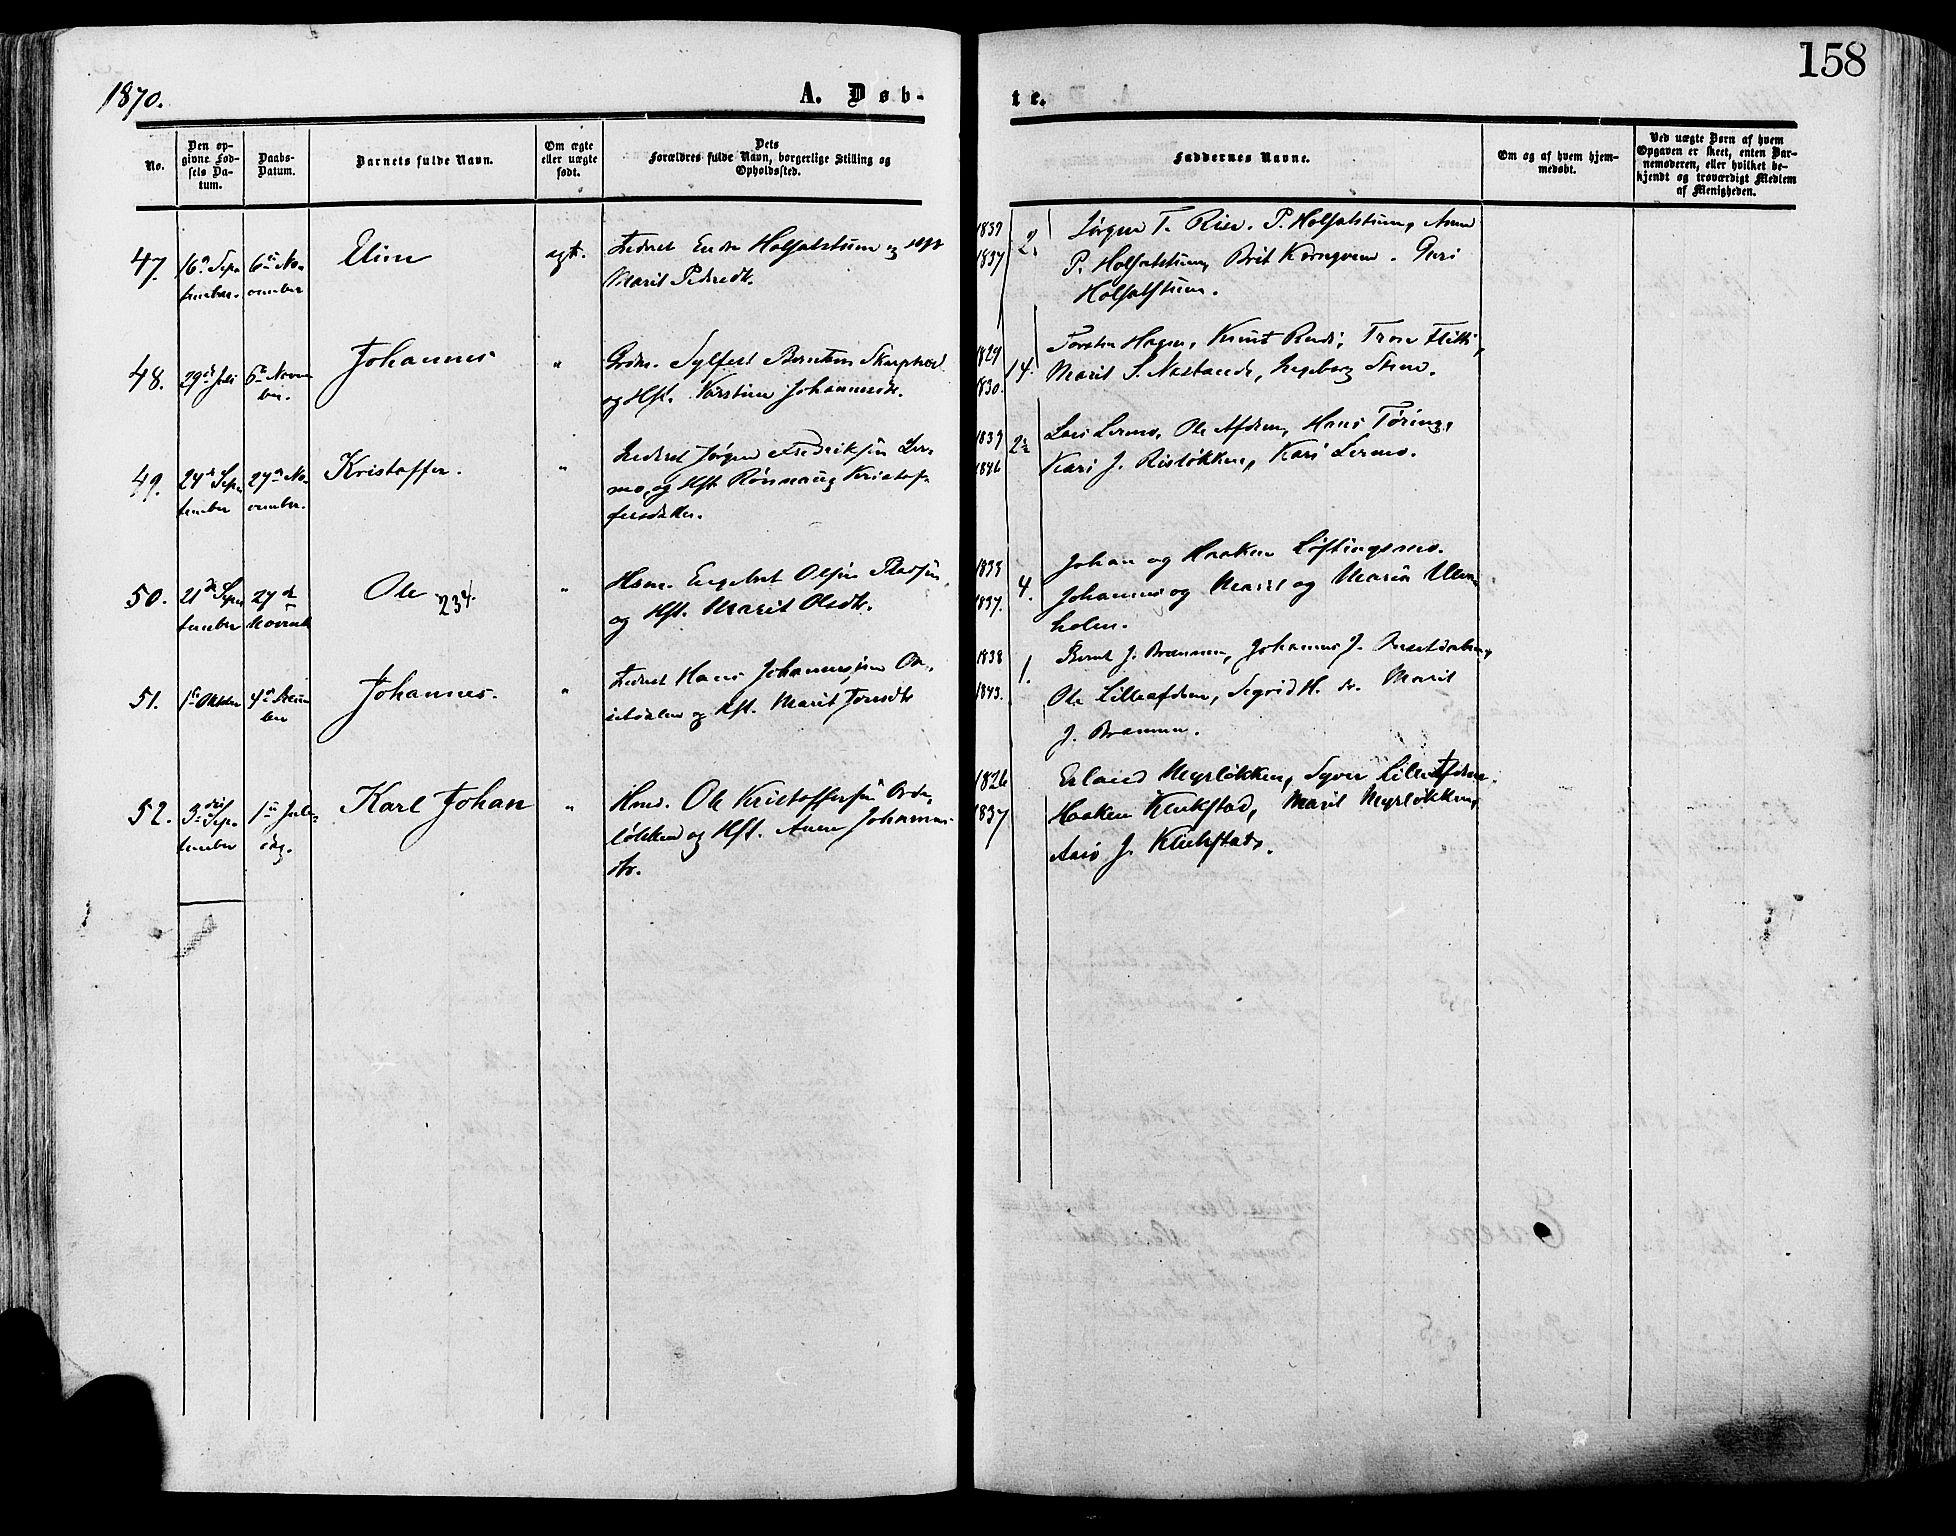 SAH, Lesja prestekontor, Ministerialbok nr. 8, 1854-1880, s. 158